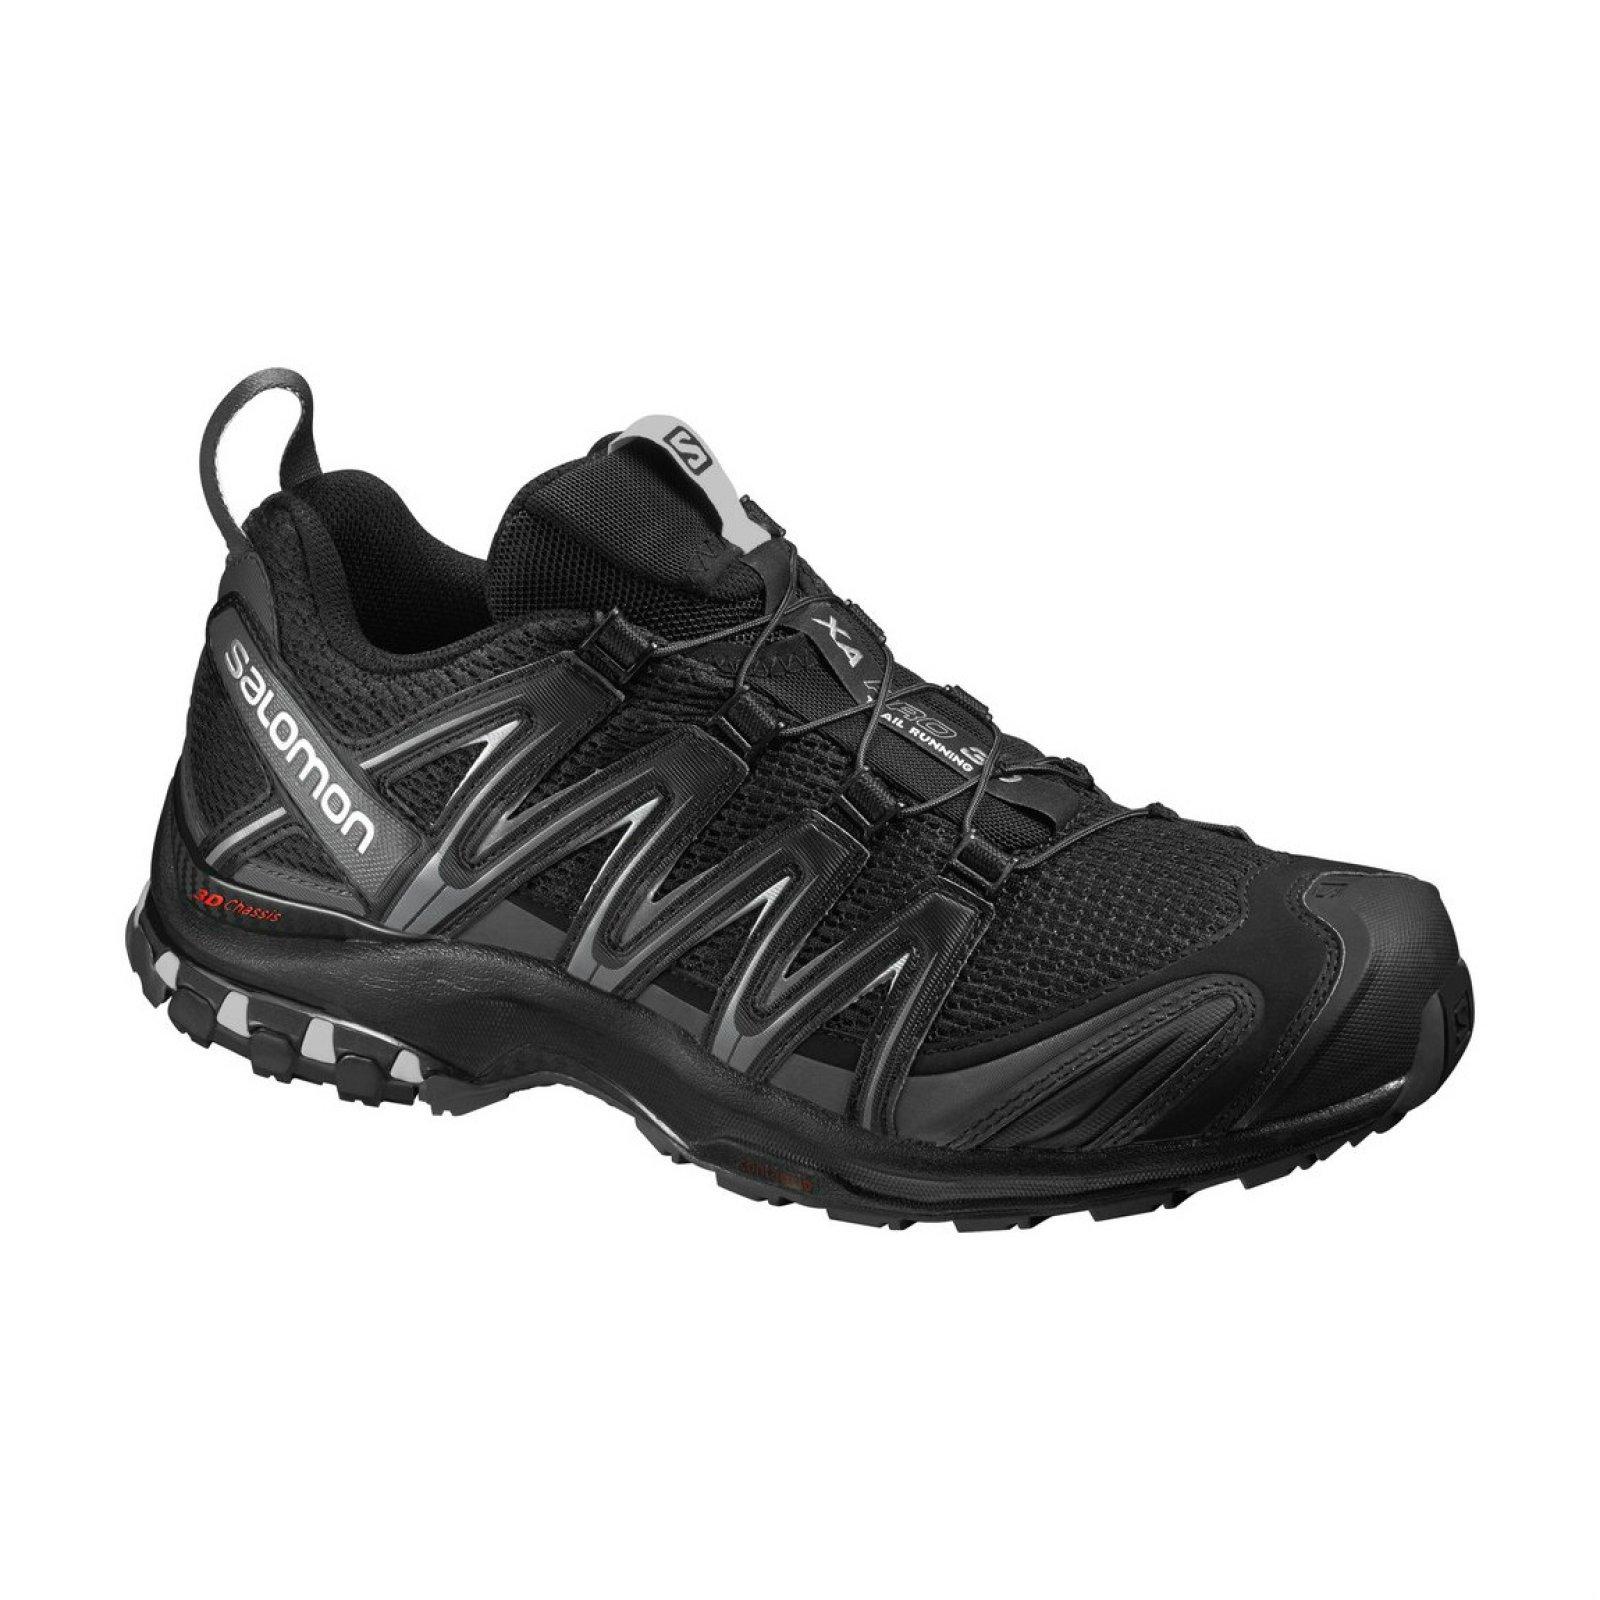 02107d9f9d3 Trailové běžecké boty Salomon XA Pro 3D M L39251400 - Actisport.cz